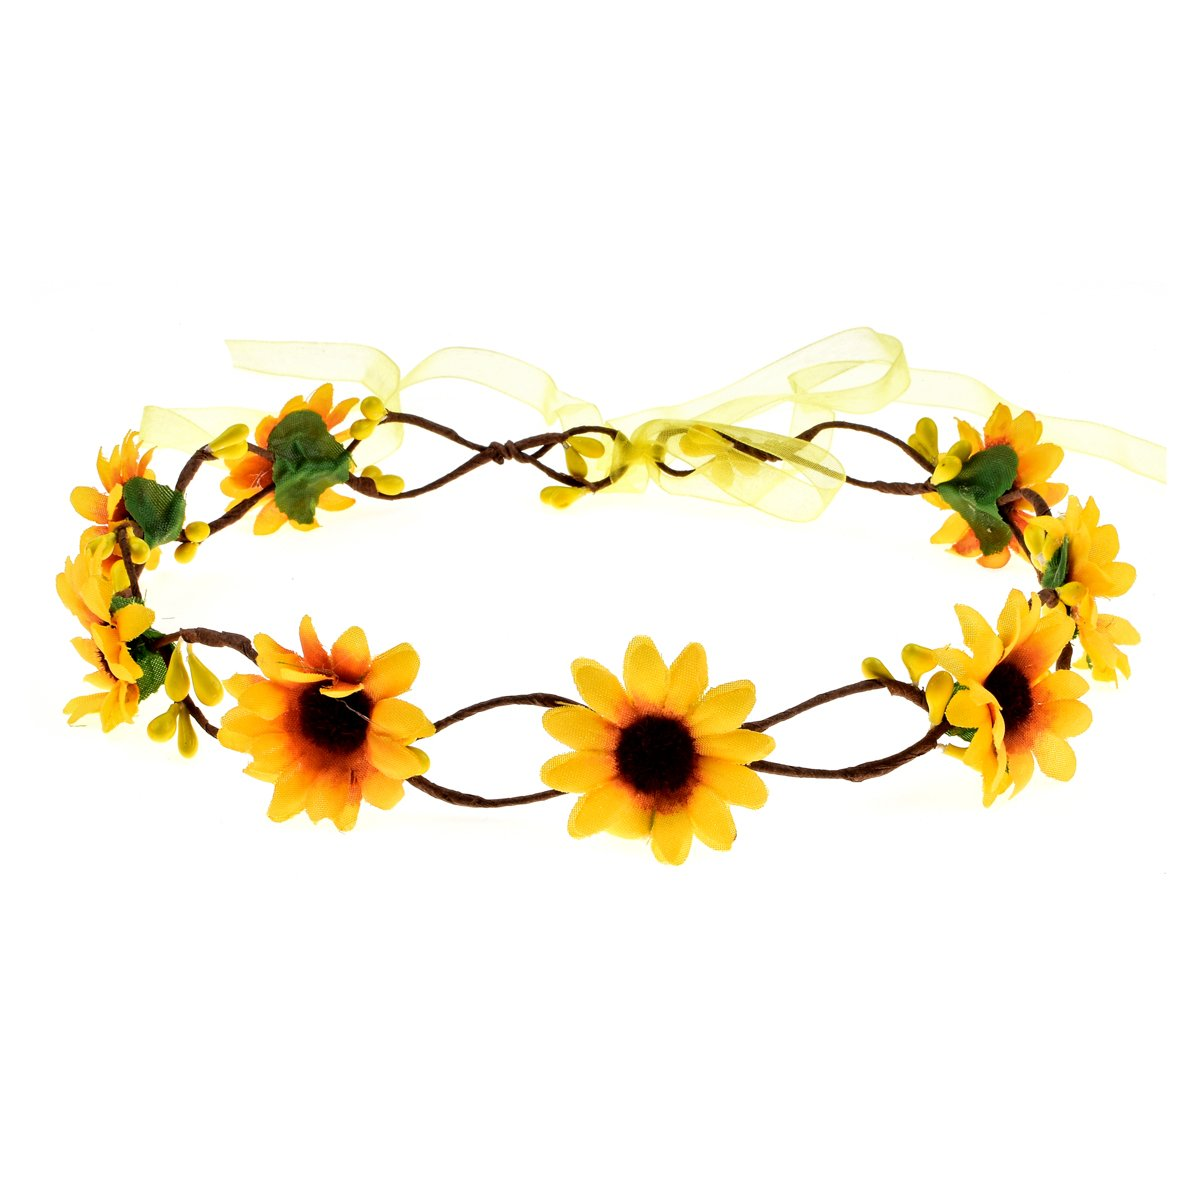 Dreamlily Festivals Floral Hair Band Adjustable Ribbon Daisy Flower